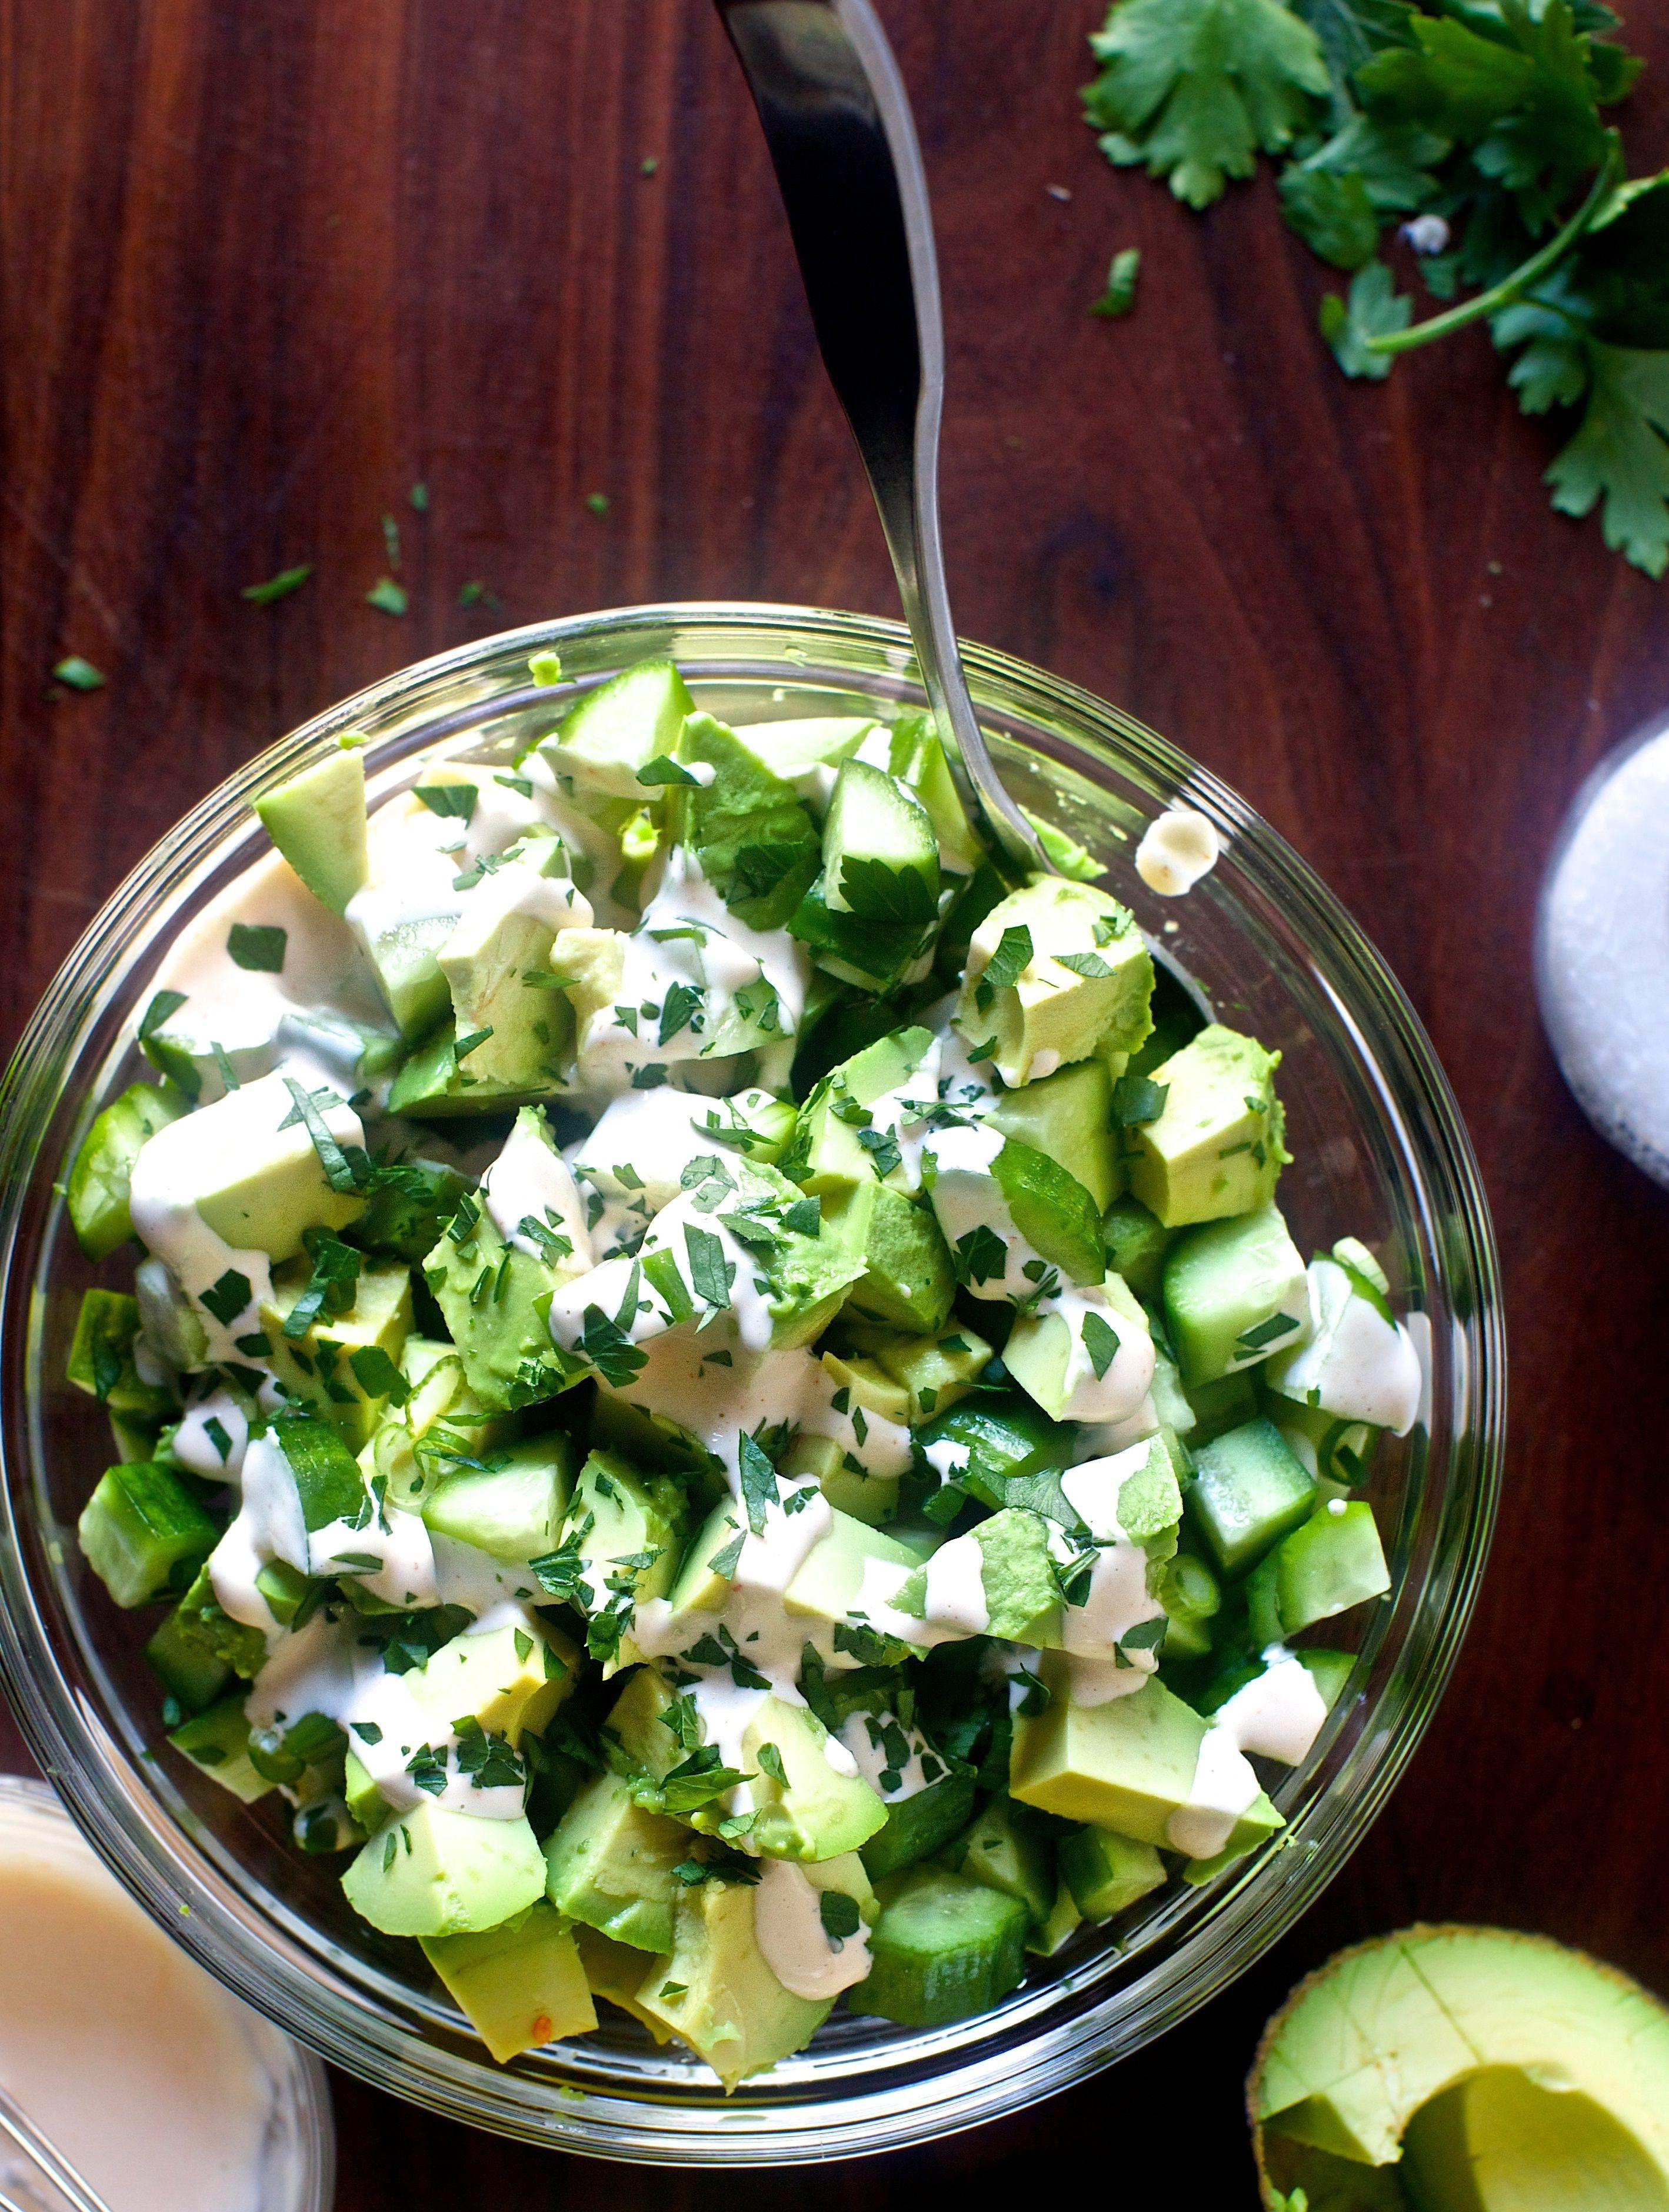 Obsessively Good Avocado Cucumber Salad Ingred Avocado Salad